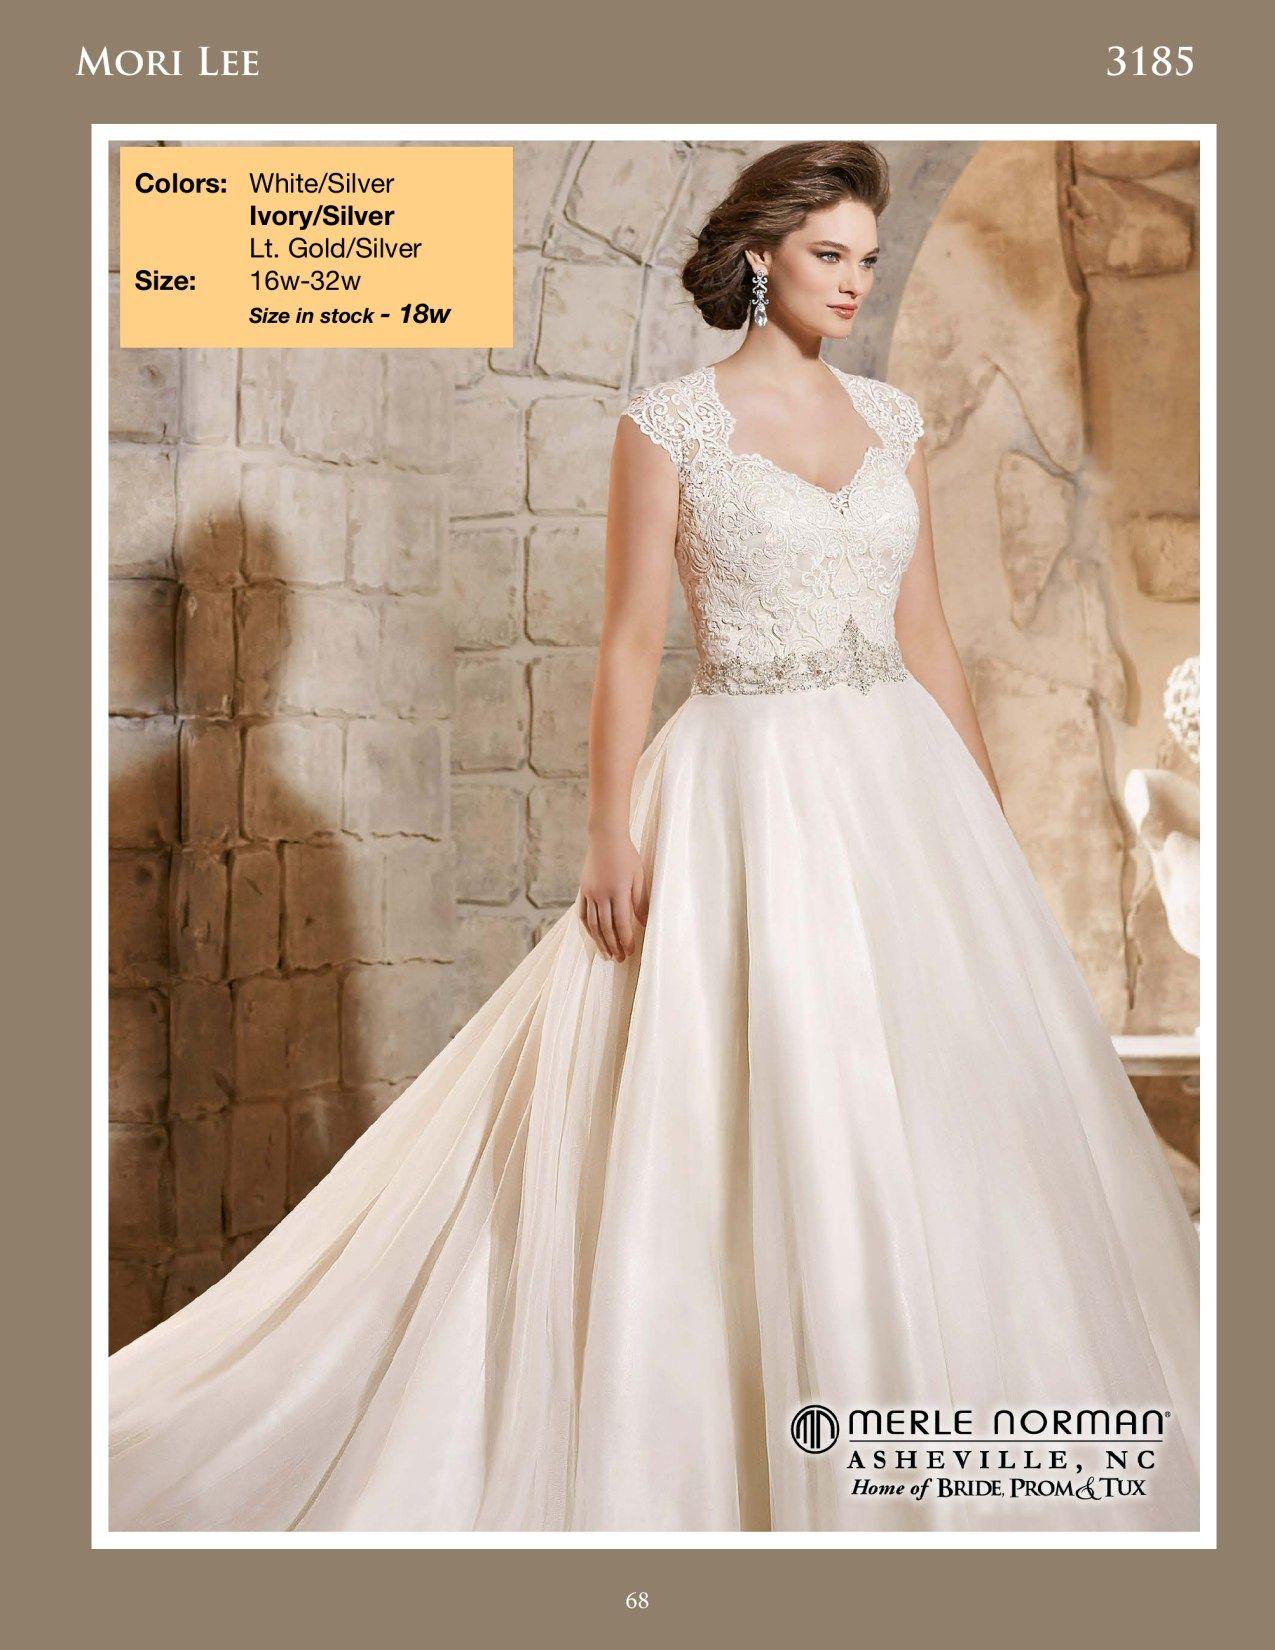 Gold white wedding dress  Mori Lee   MoriLee Bridal  Pinterest  Prom tux and Mori lee